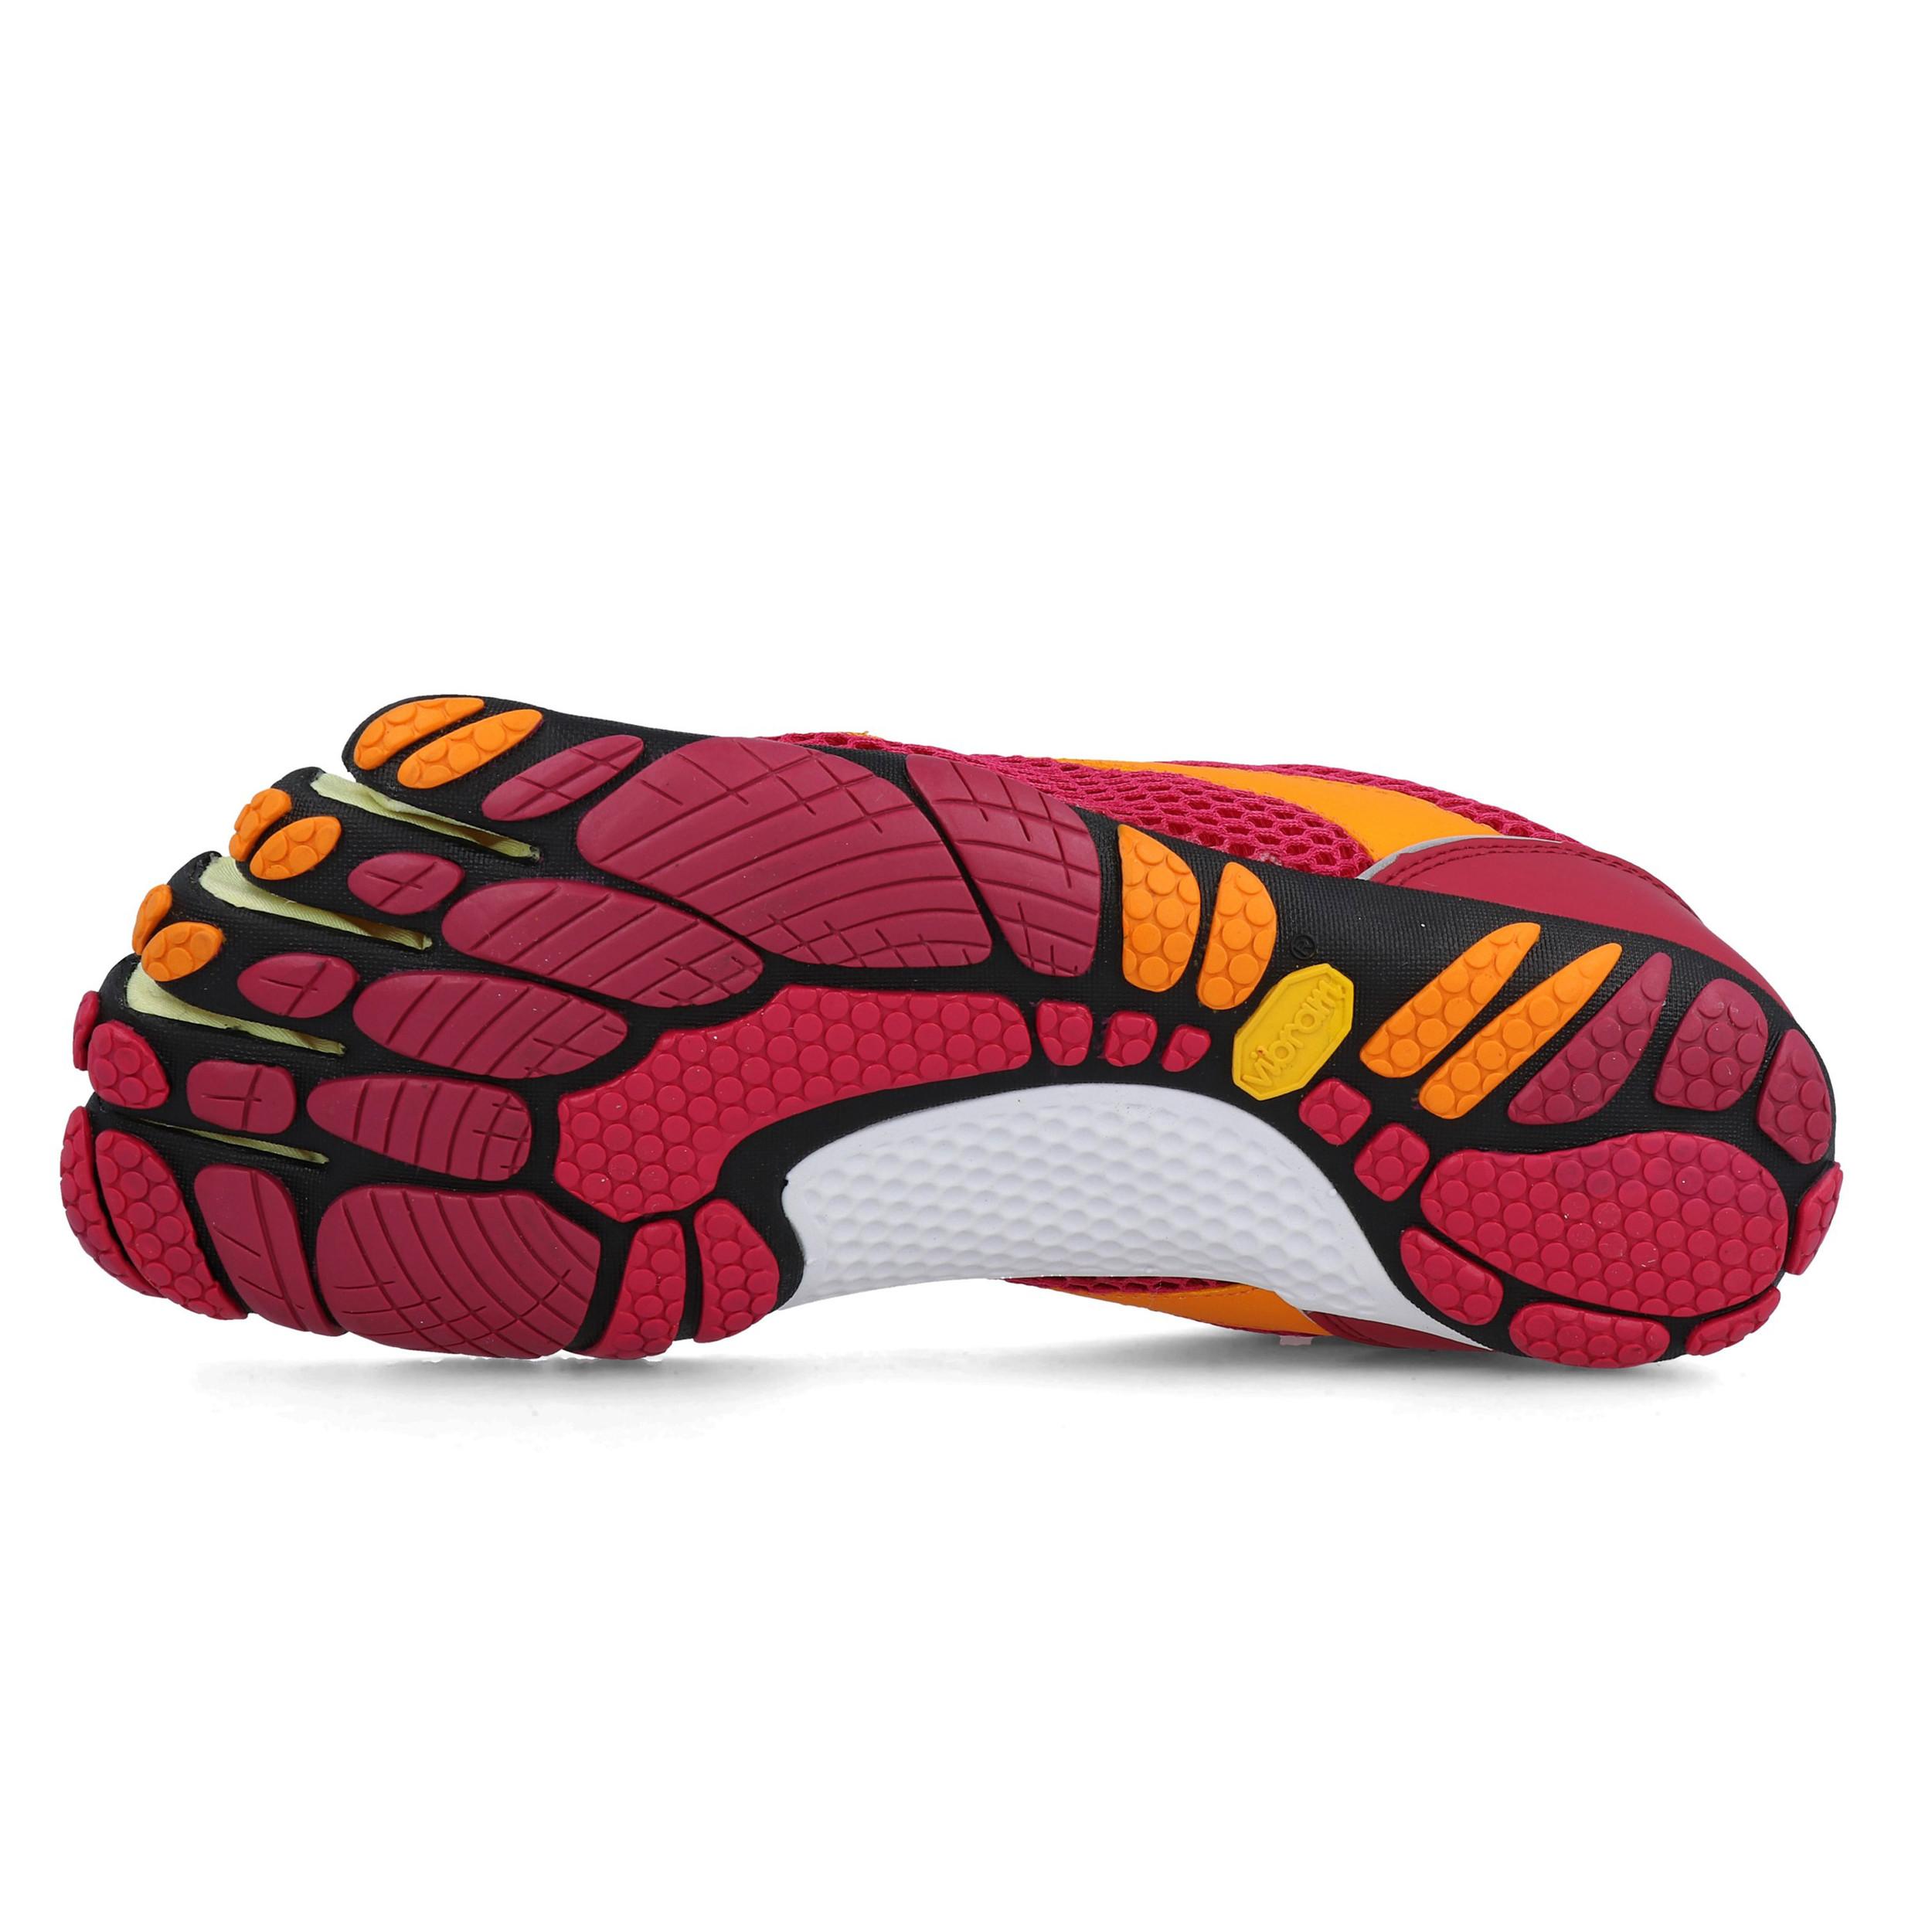 Vibram Damen FiveFingers Speed Turnschuhe Laufschuhe Sneaker Orange Rosa Sport